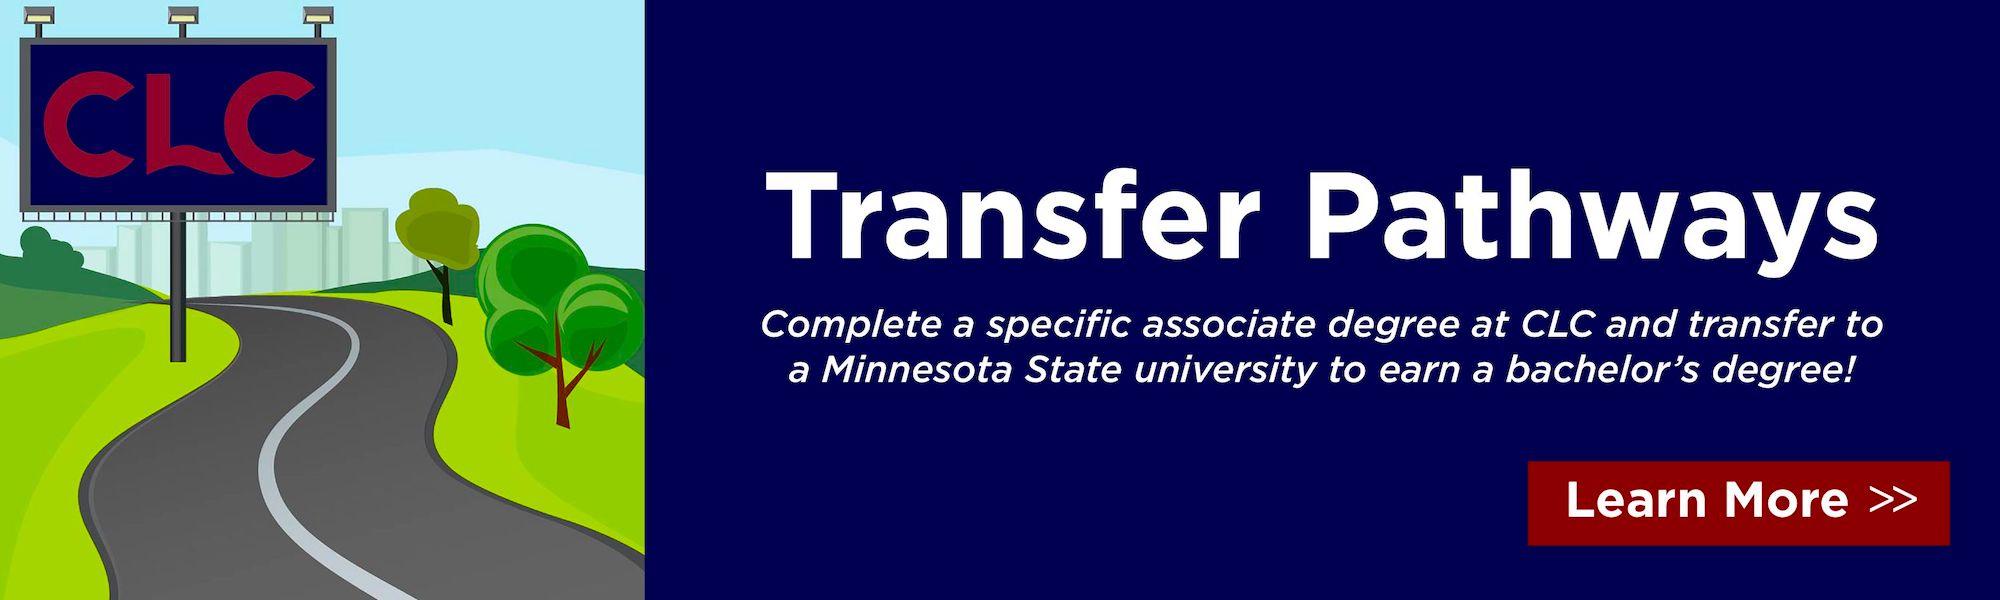 transfer pathways